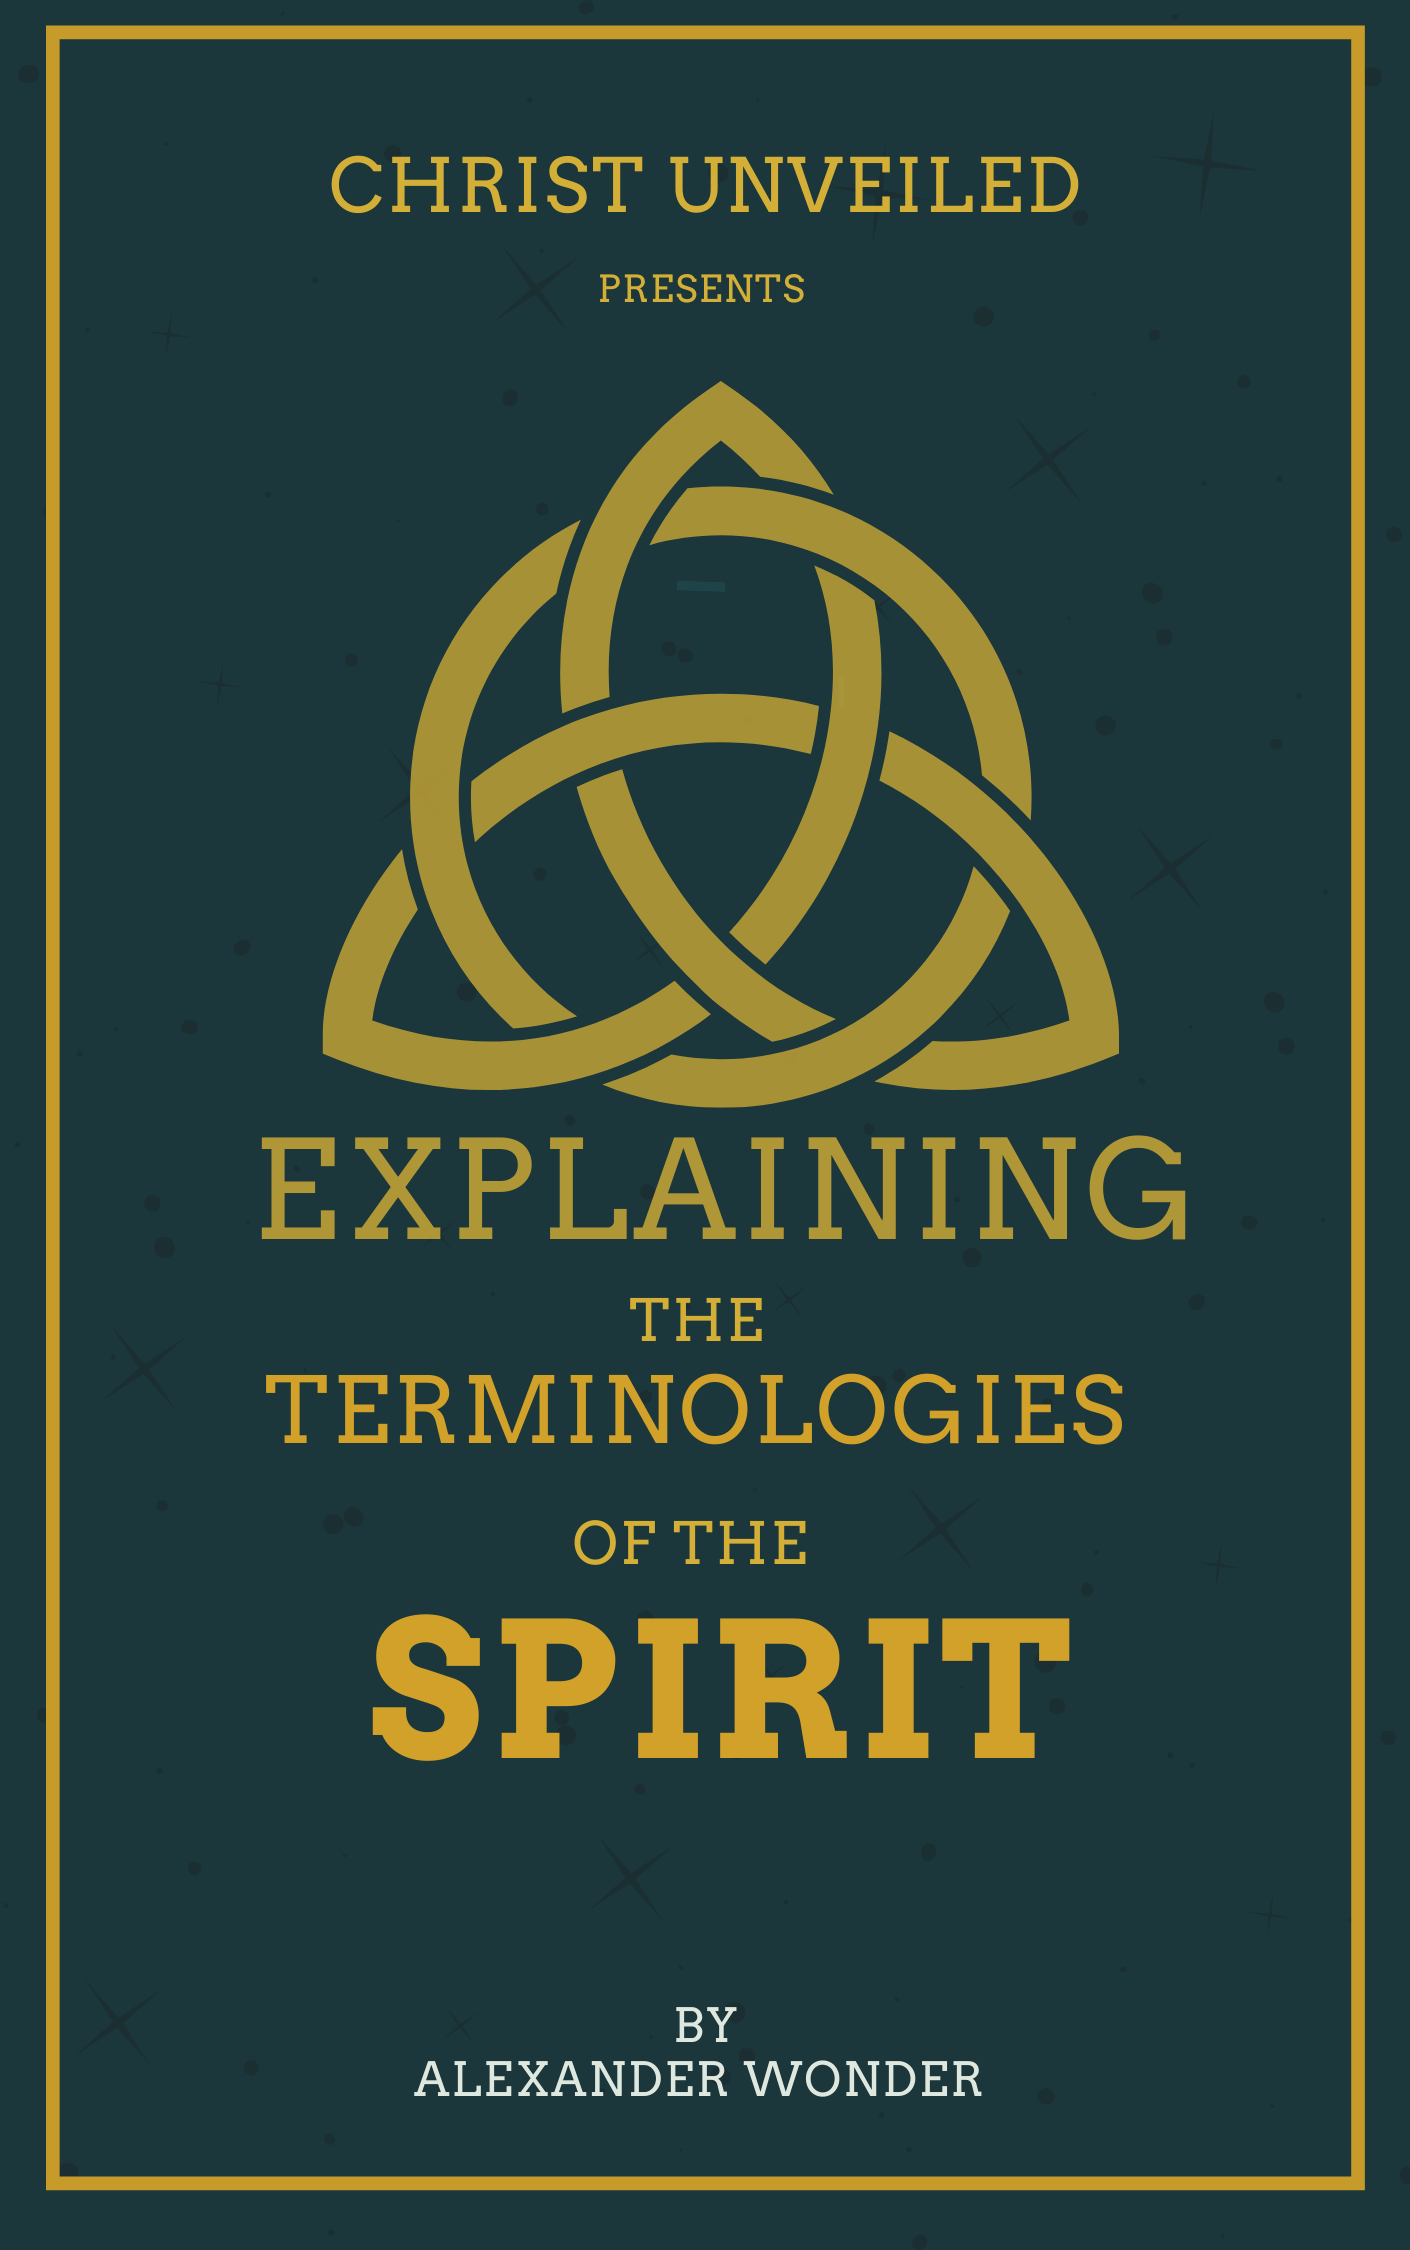 Christ Unveiled presents Explaining The Terminologies Of The Spirit by Alexander Wonder lindaikejisblog